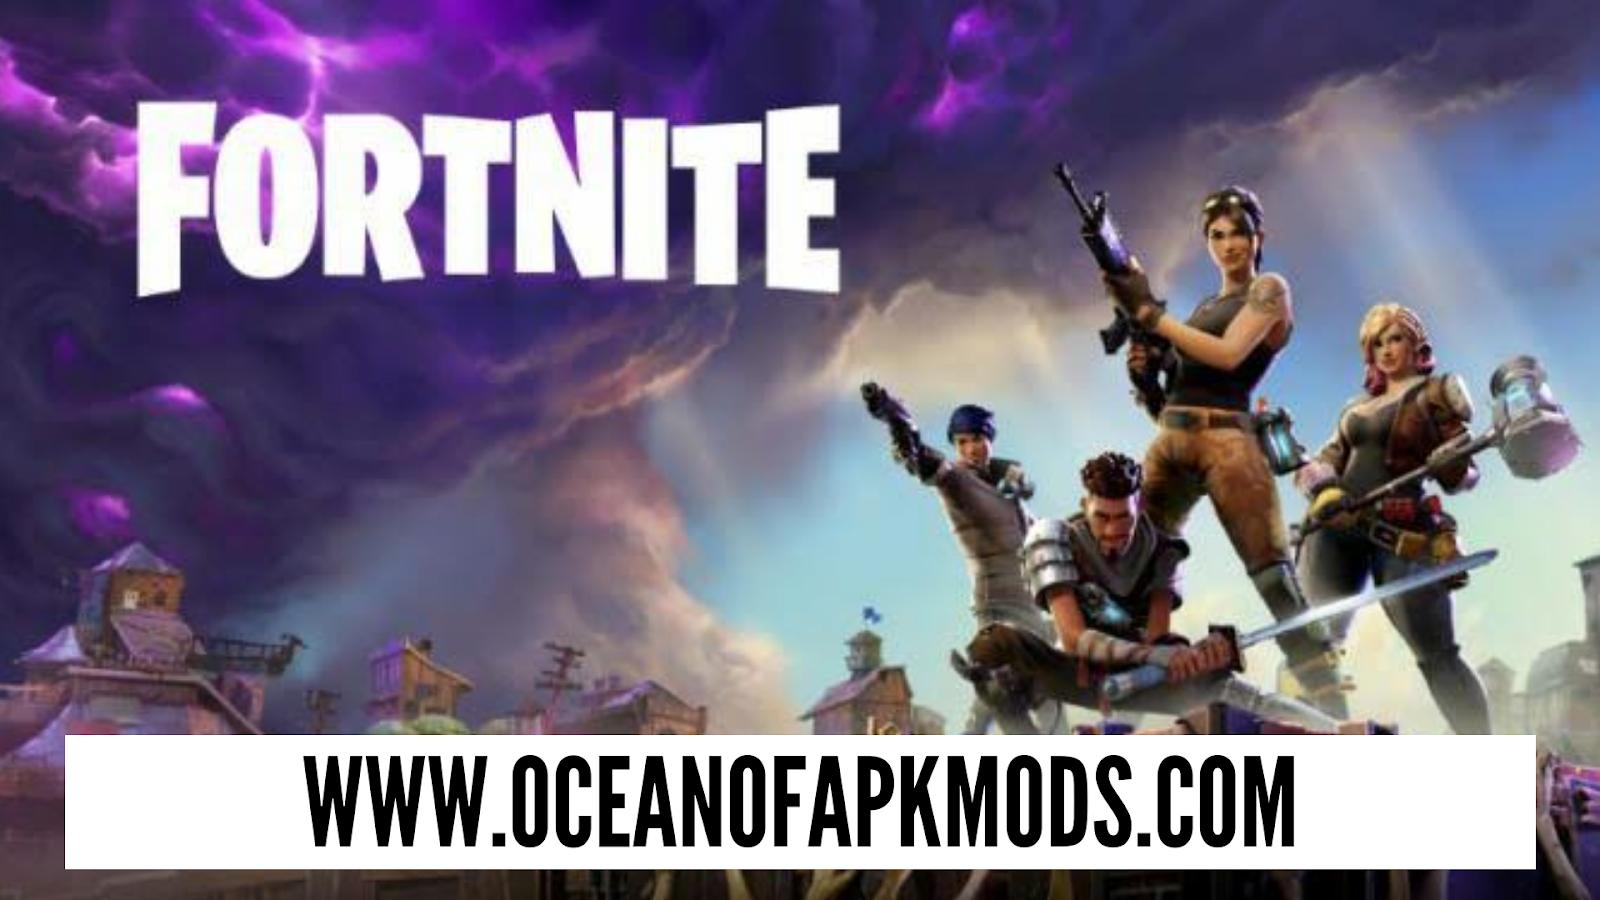 Fortnite Battle Royale In Free Apk Obb Download Ocean Of Apk Mods